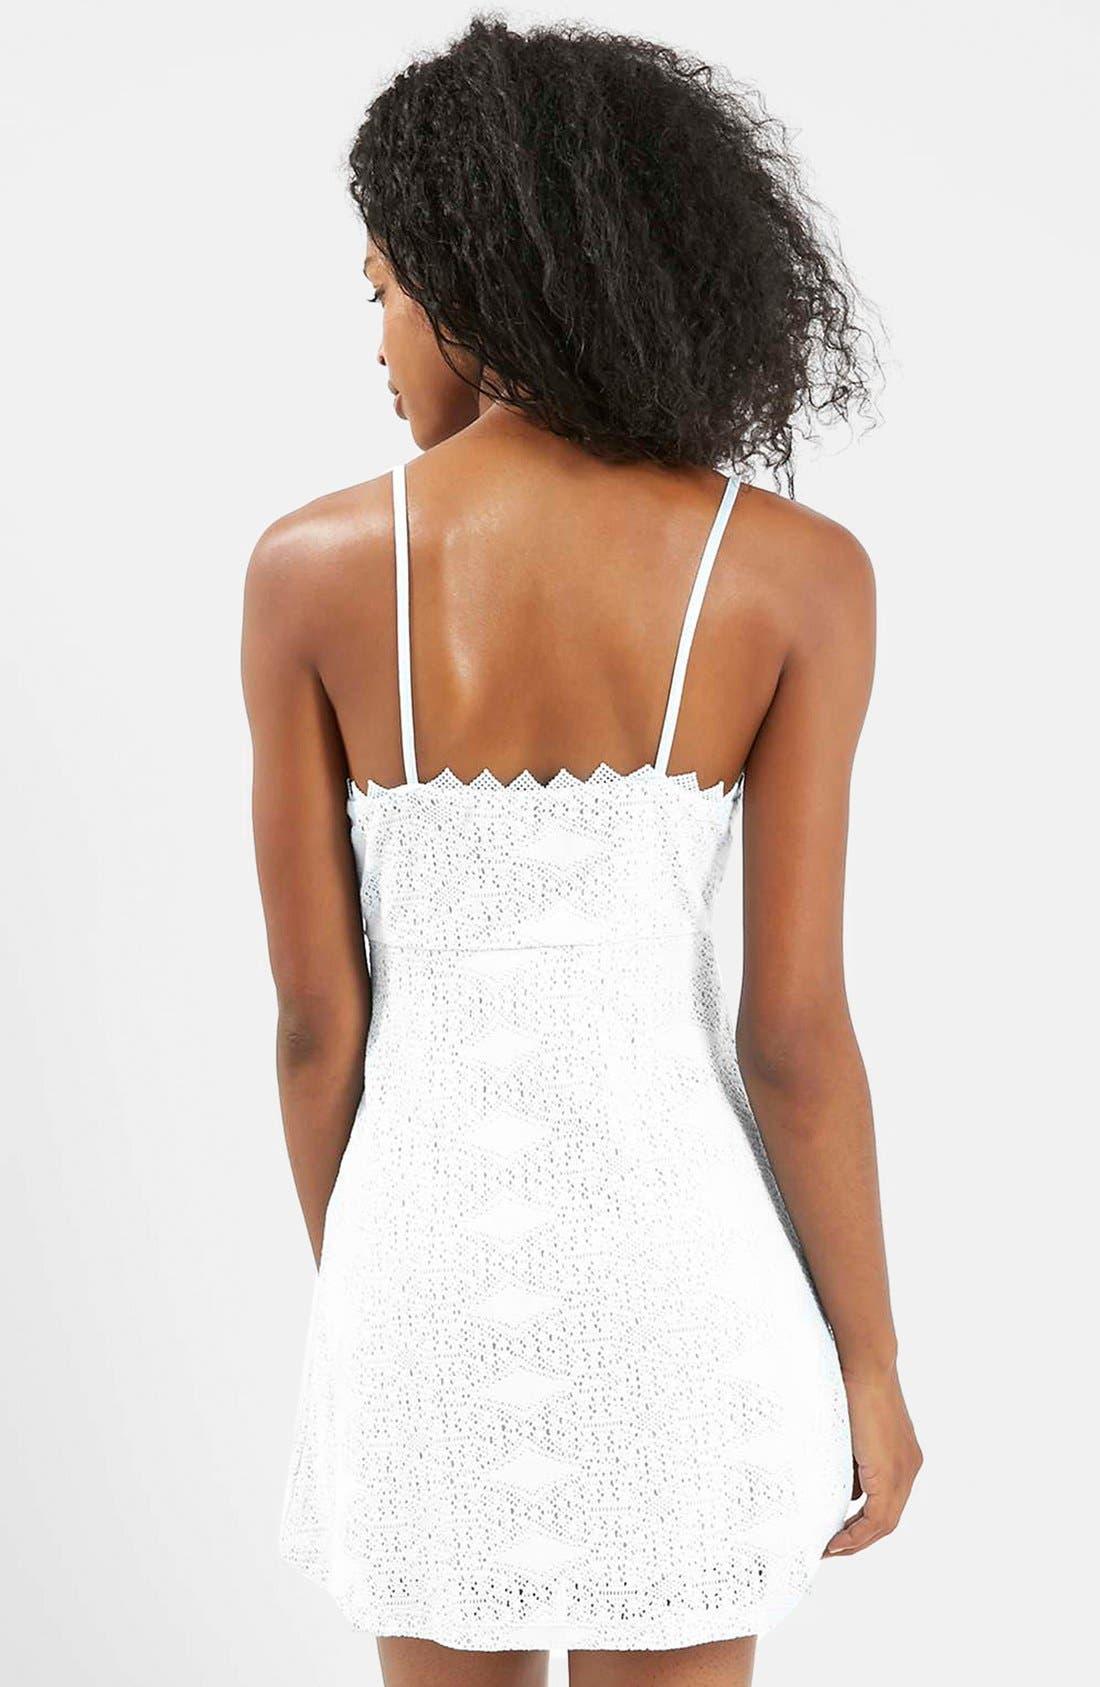 TOPSHOP,                             Crochet Dress,                             Alternate thumbnail 4, color,                             900